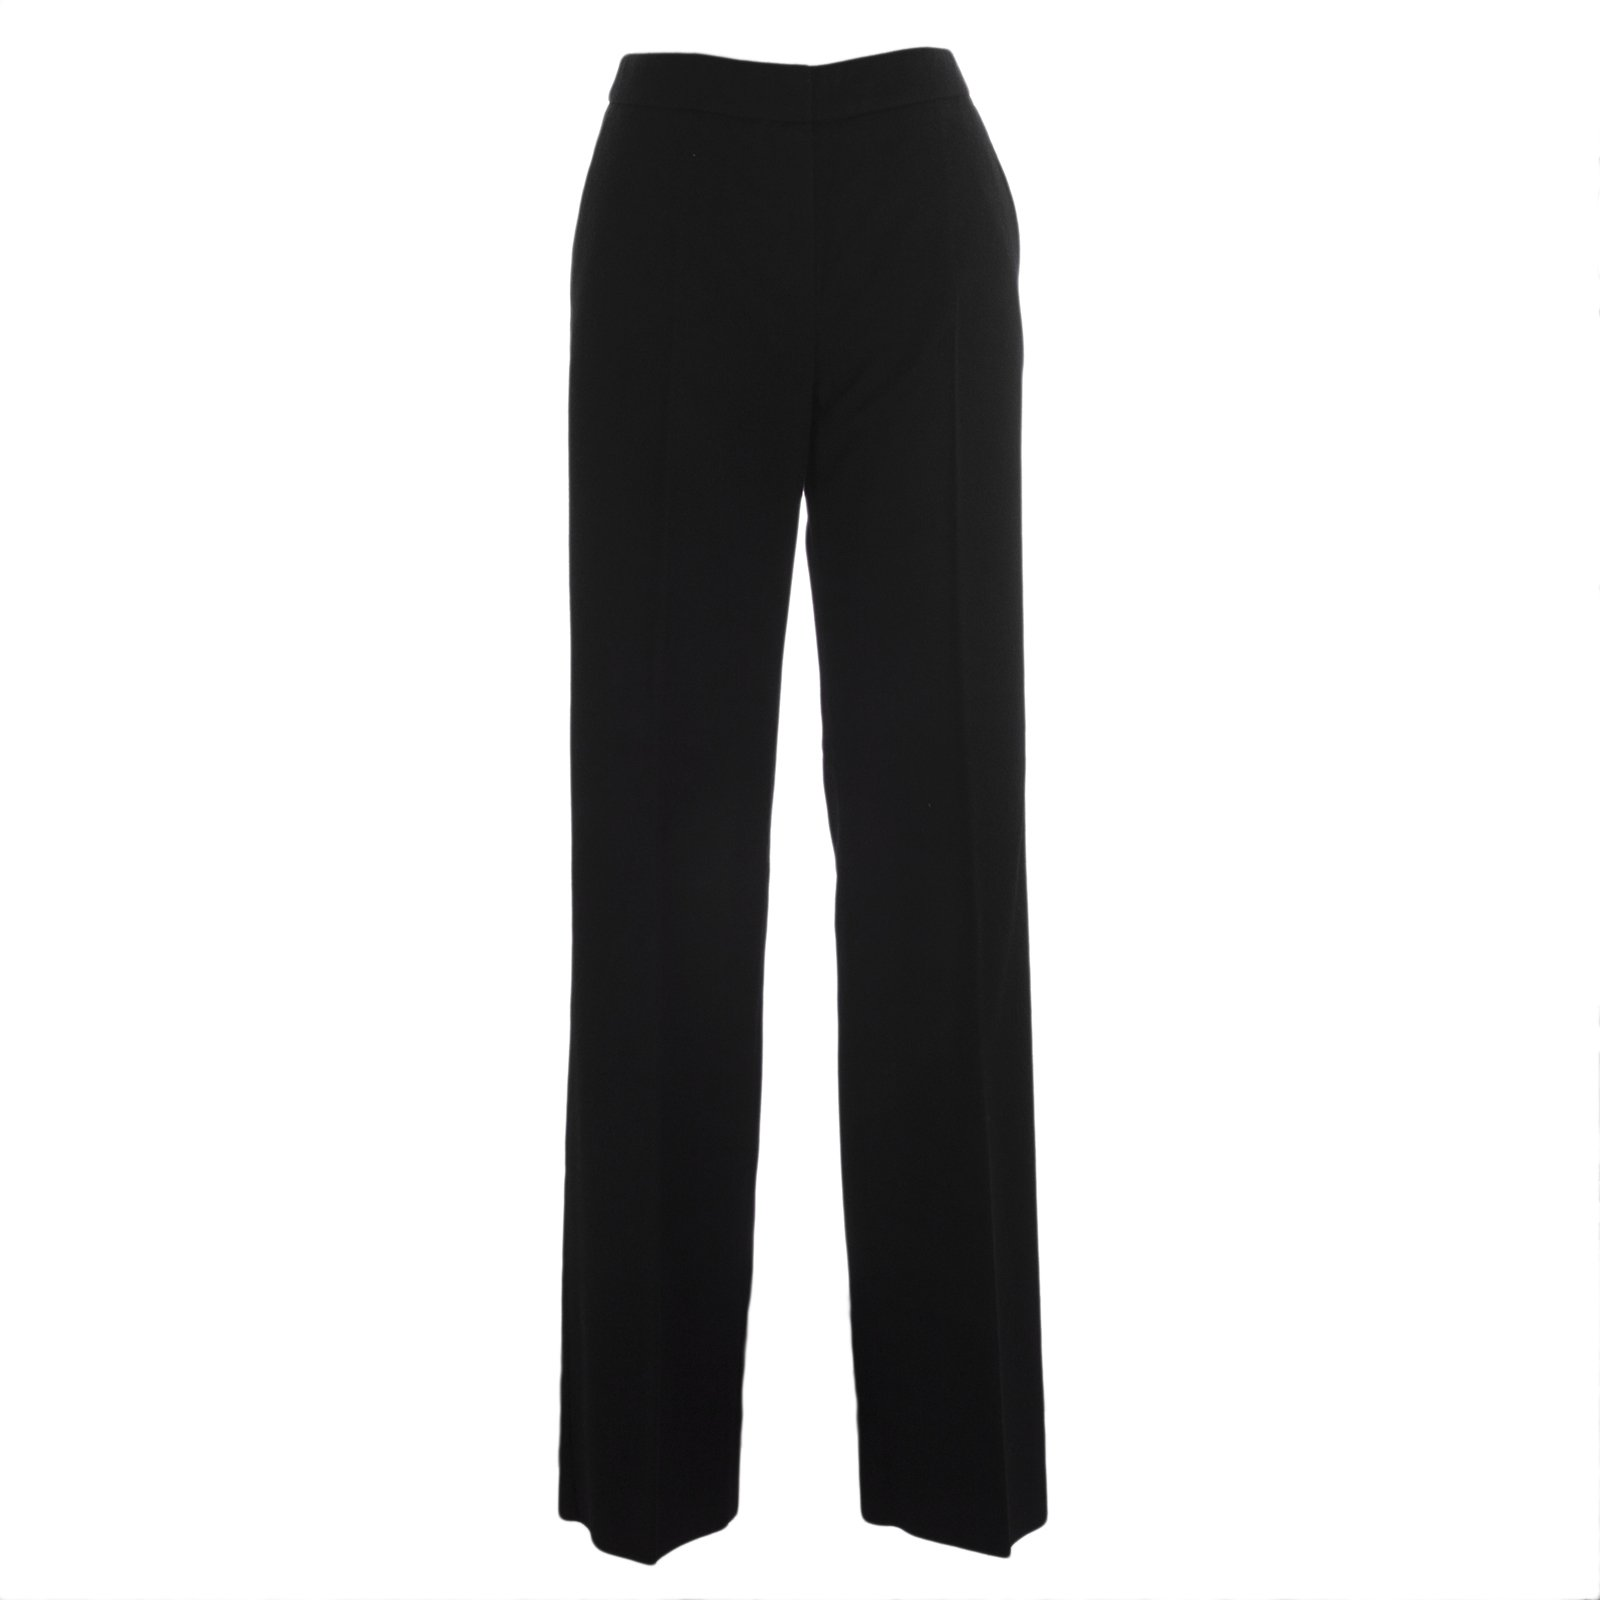 Max Mara Women's Pescia High-Rise Trousers Sz 4 Black